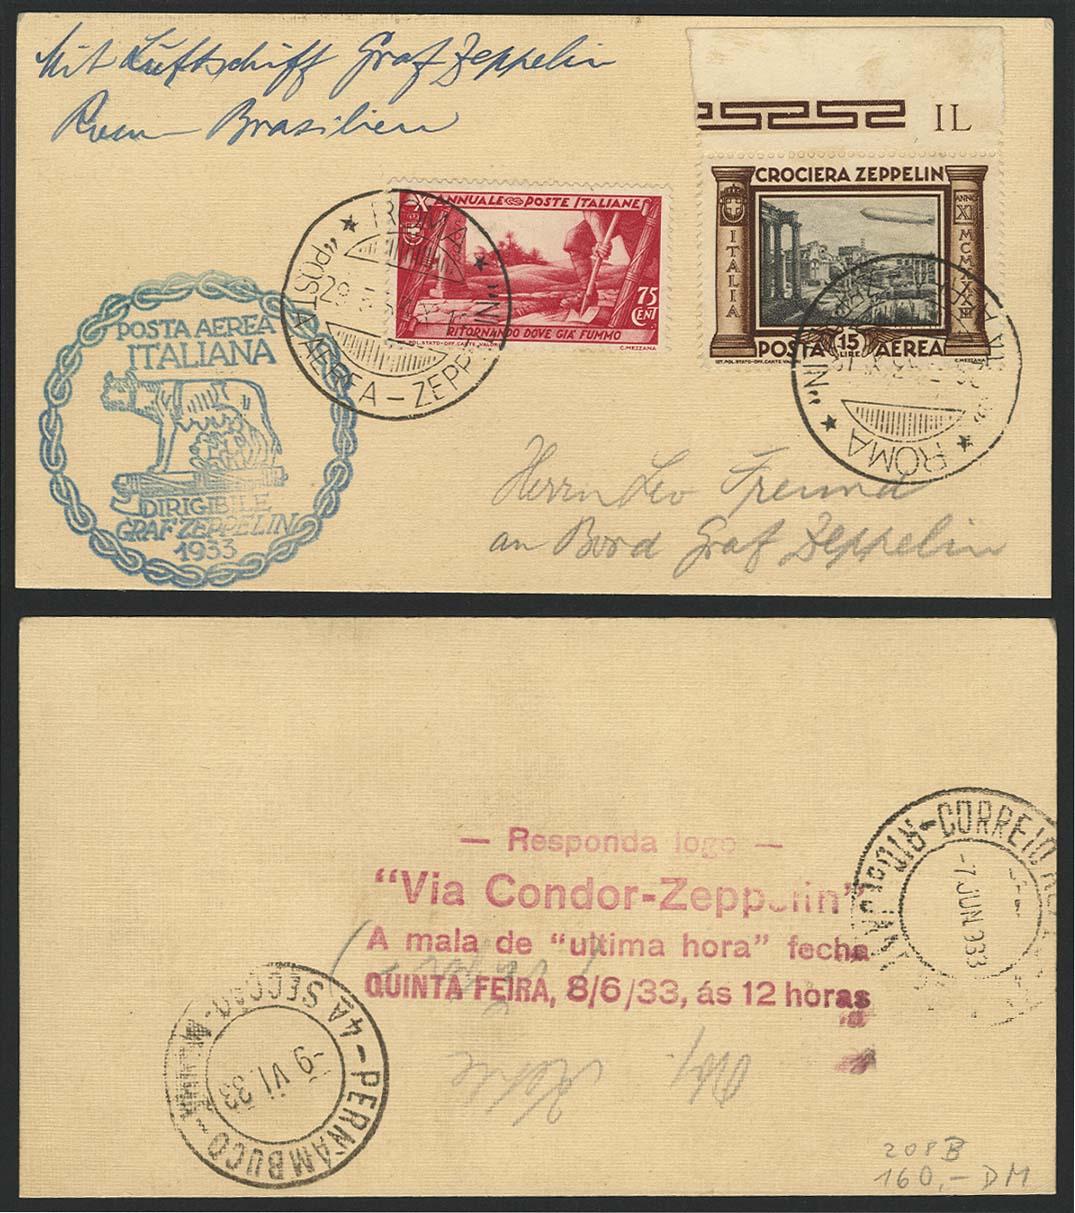 Lot 4322 - zeppelinpost nach sieger LZ 127 - 1933 -  Auktionshaus Ulrich Felzmann GmbH & Co. KG